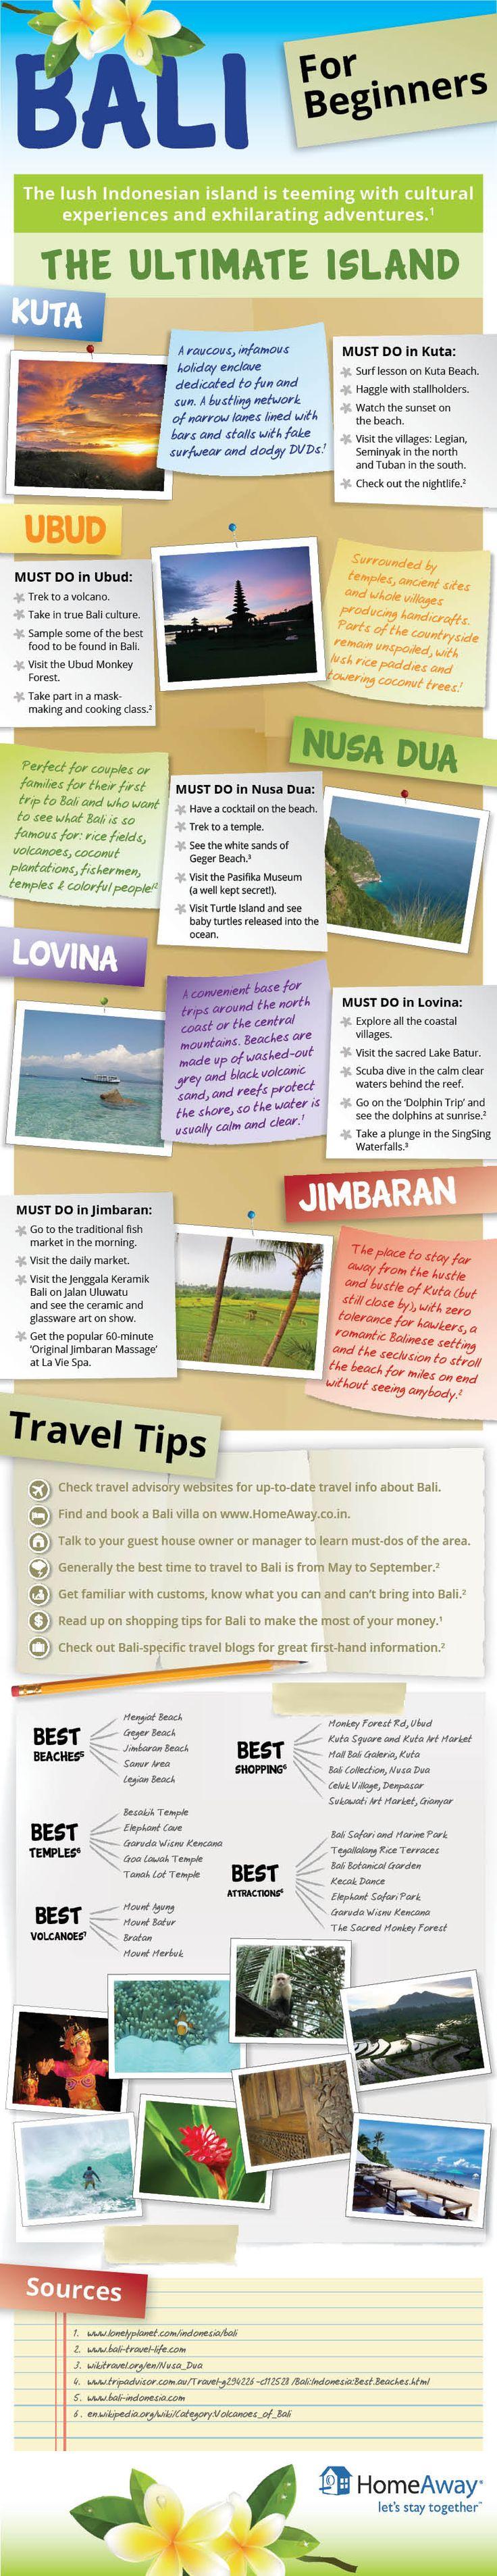 Bali for beginners